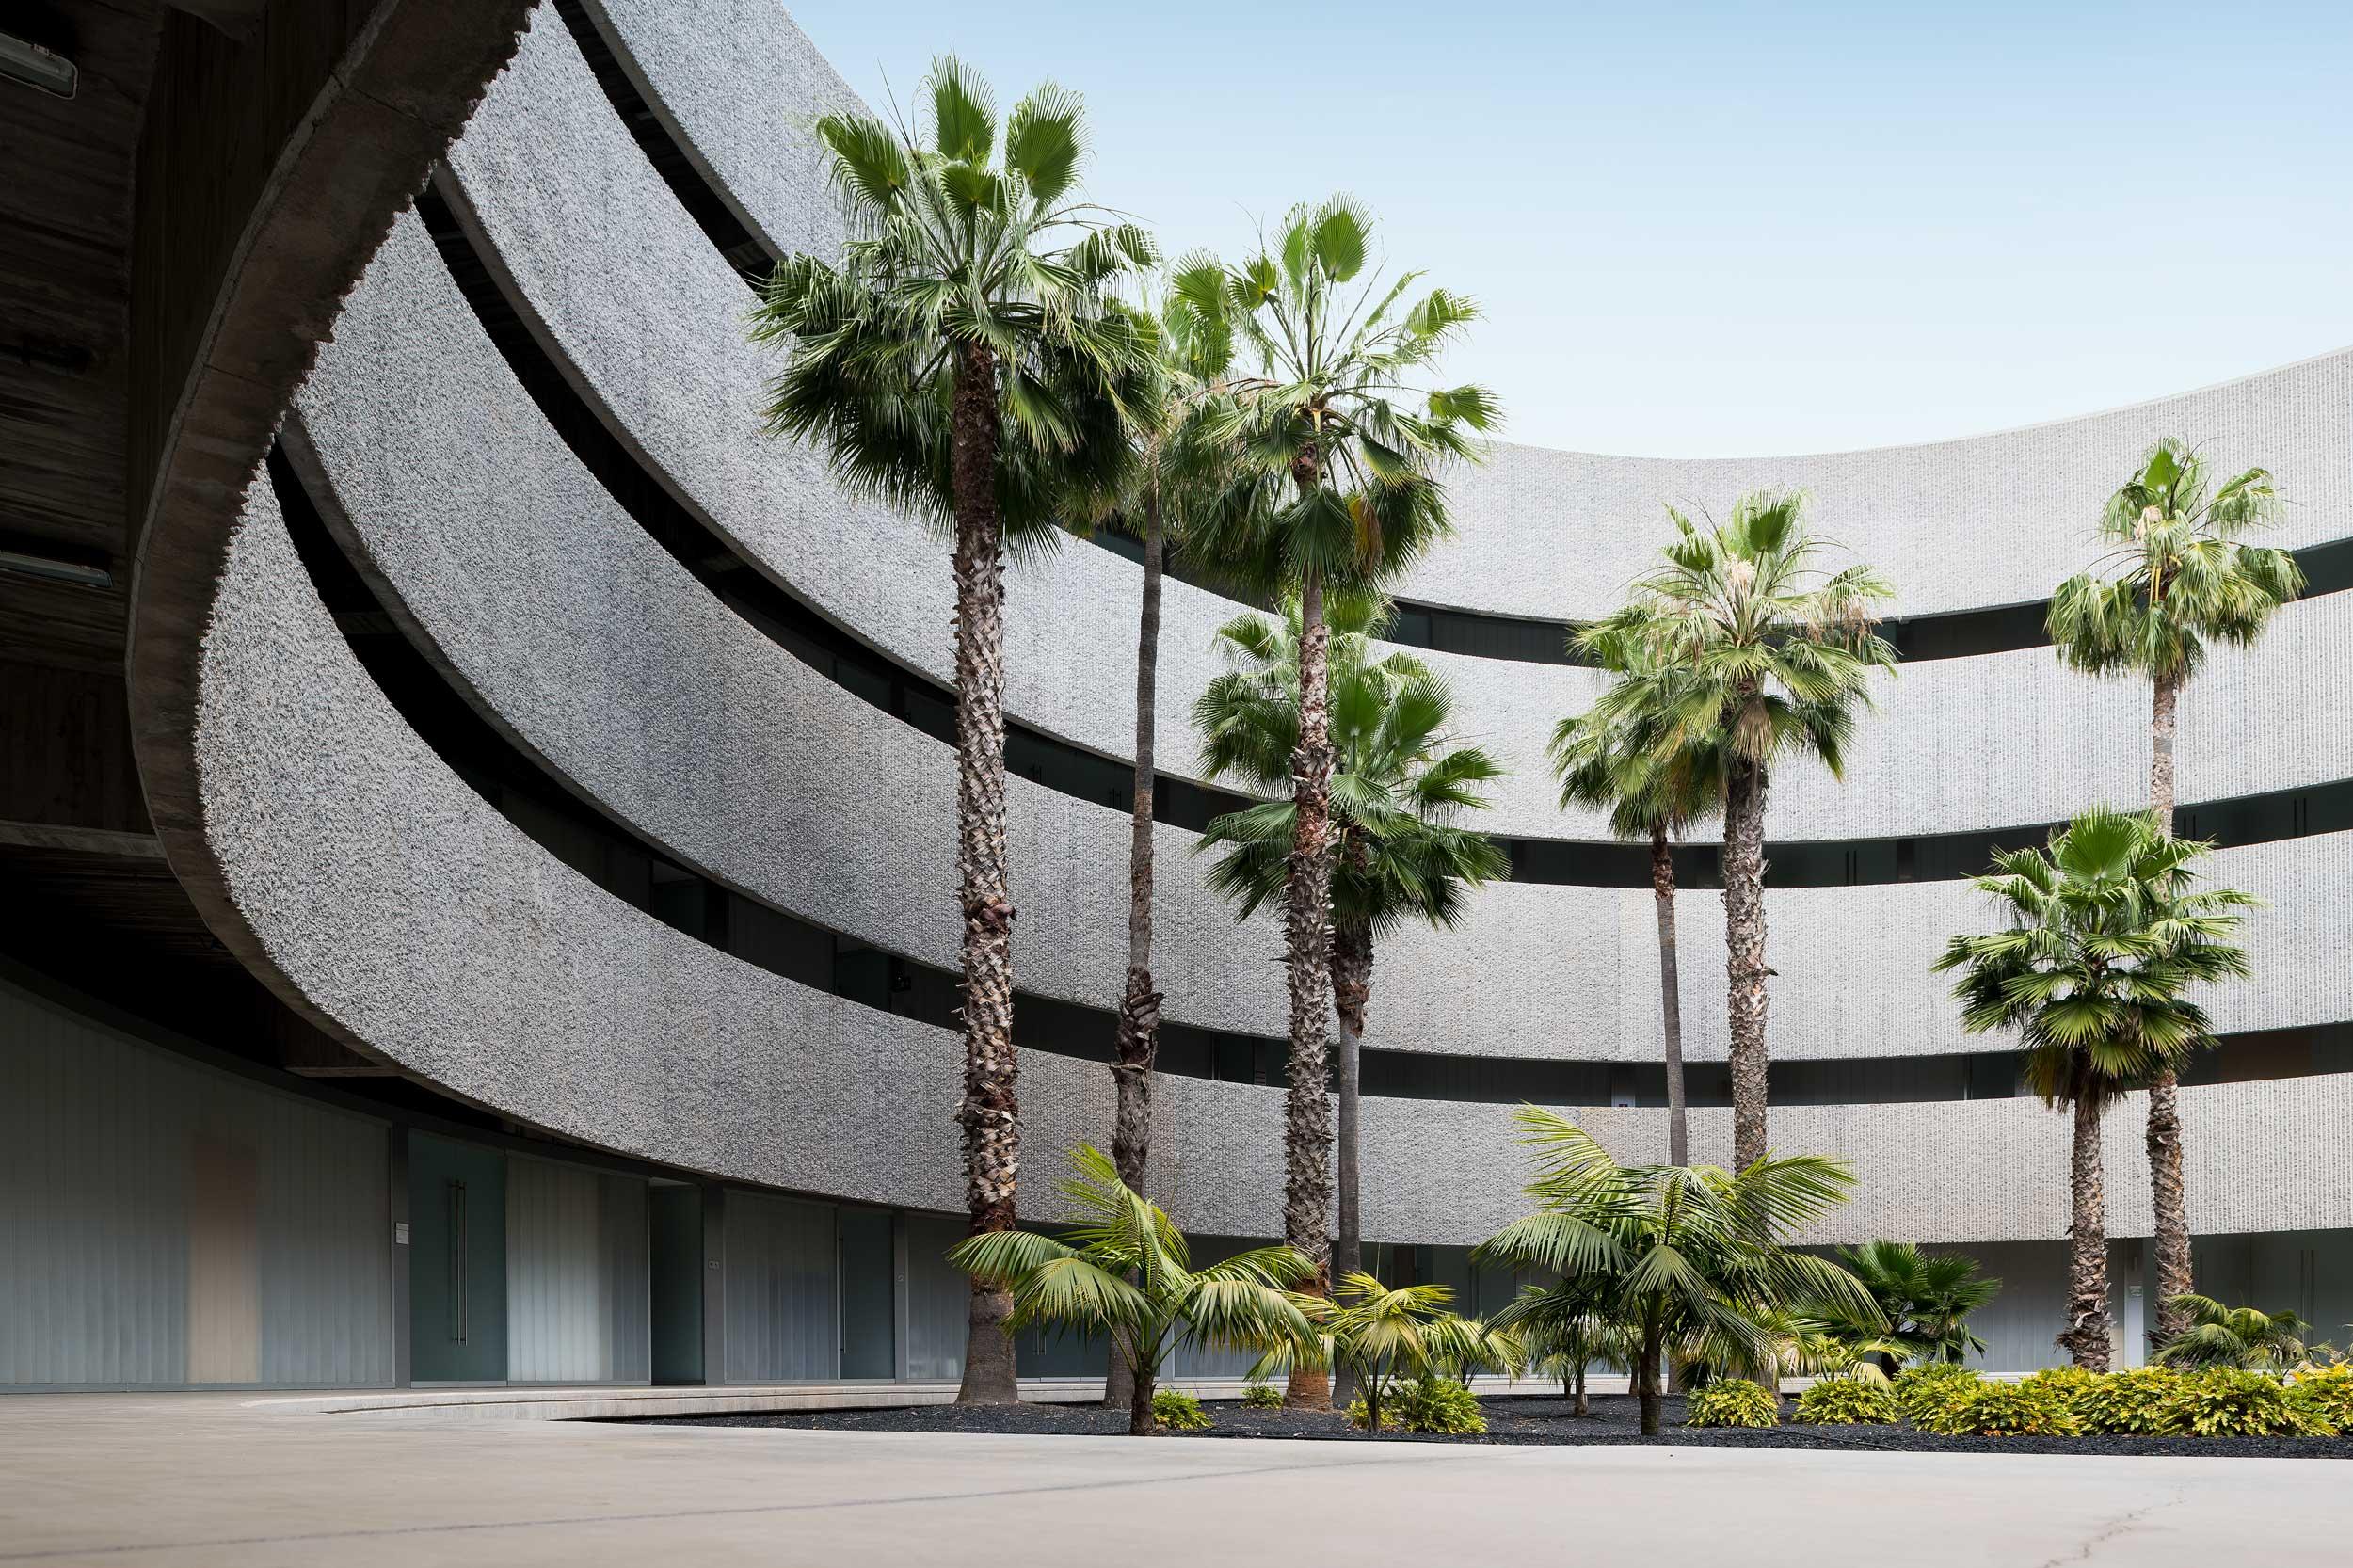 Projcet op Tenerife in ons portfolio architectuurfotografie